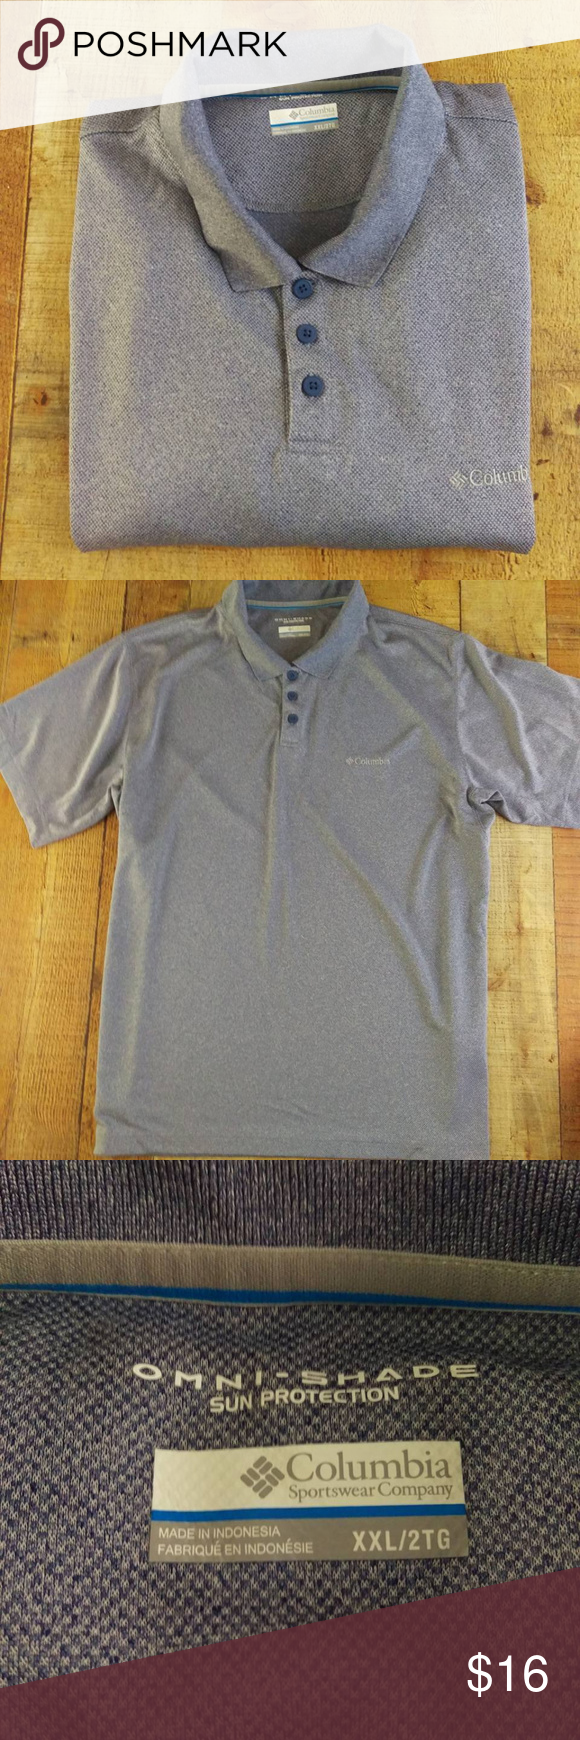 Columbia Sport Polo Golf Shirt Heather Grey Columbia Omni Shade